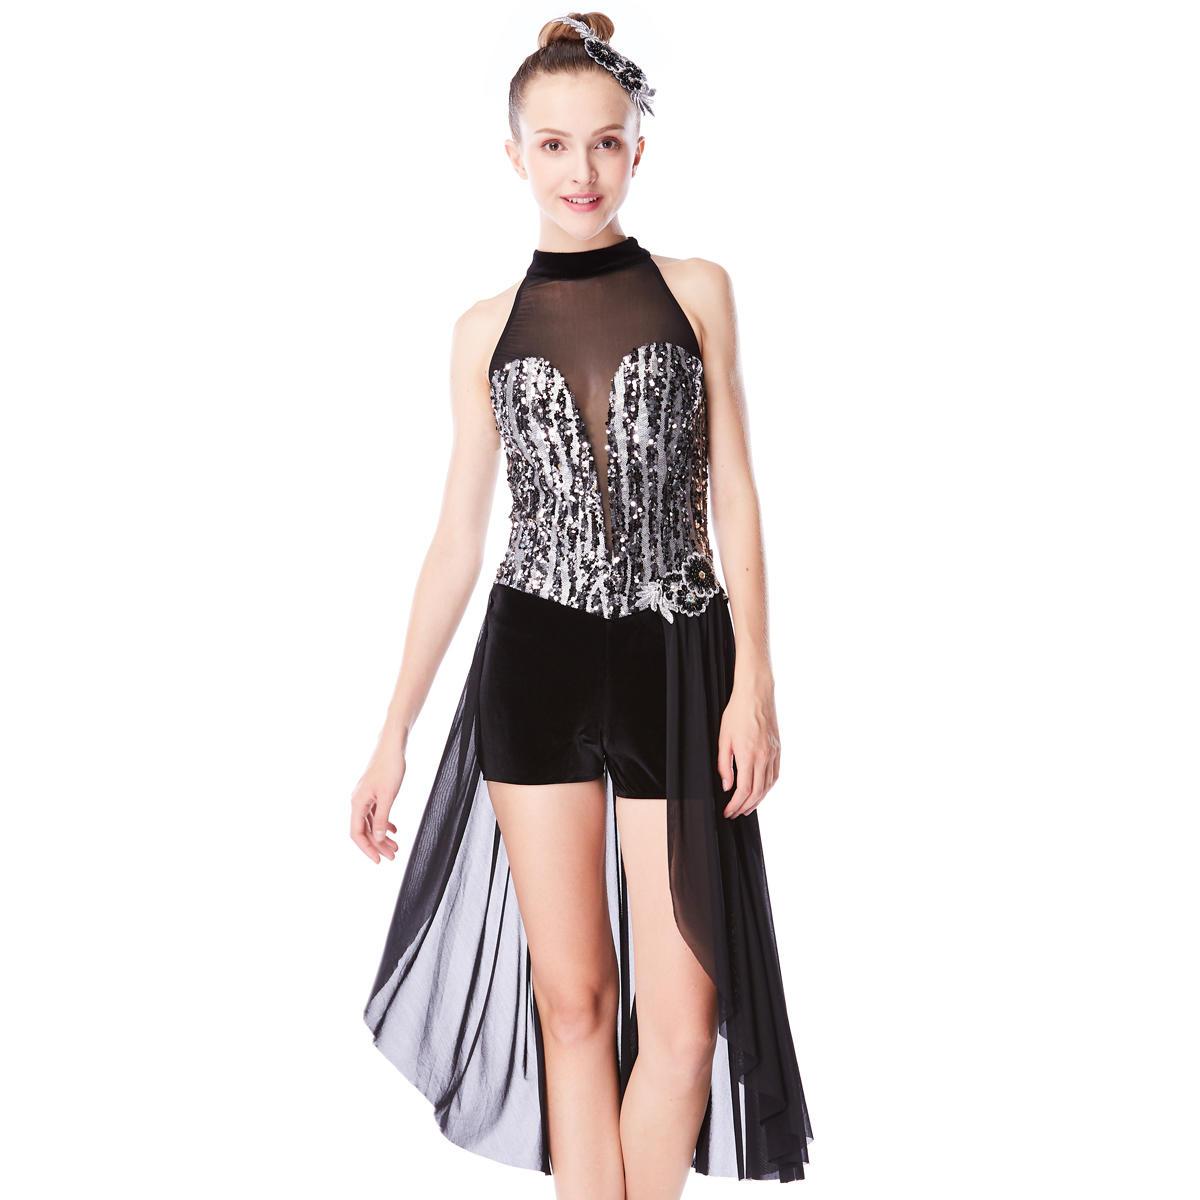 MiDee Sequins Cheap Christmas Adult Ballet Tutu Dance Costume